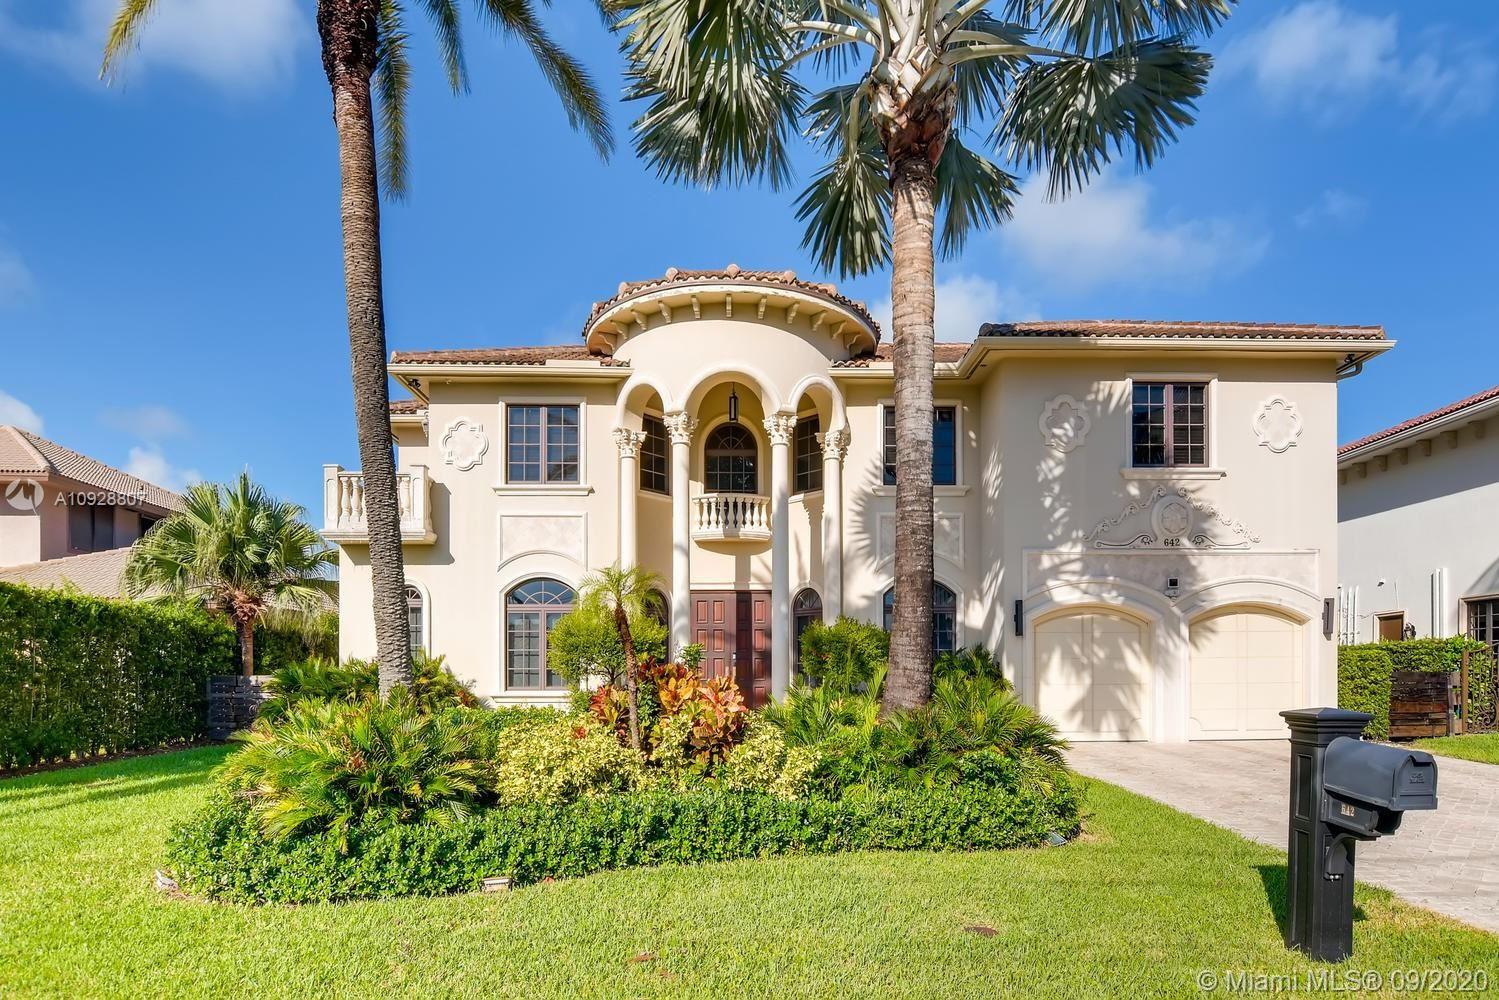 Photo of 642 Palm Dr, Hallandale Beach, FL 33009 (MLS # A10928807)